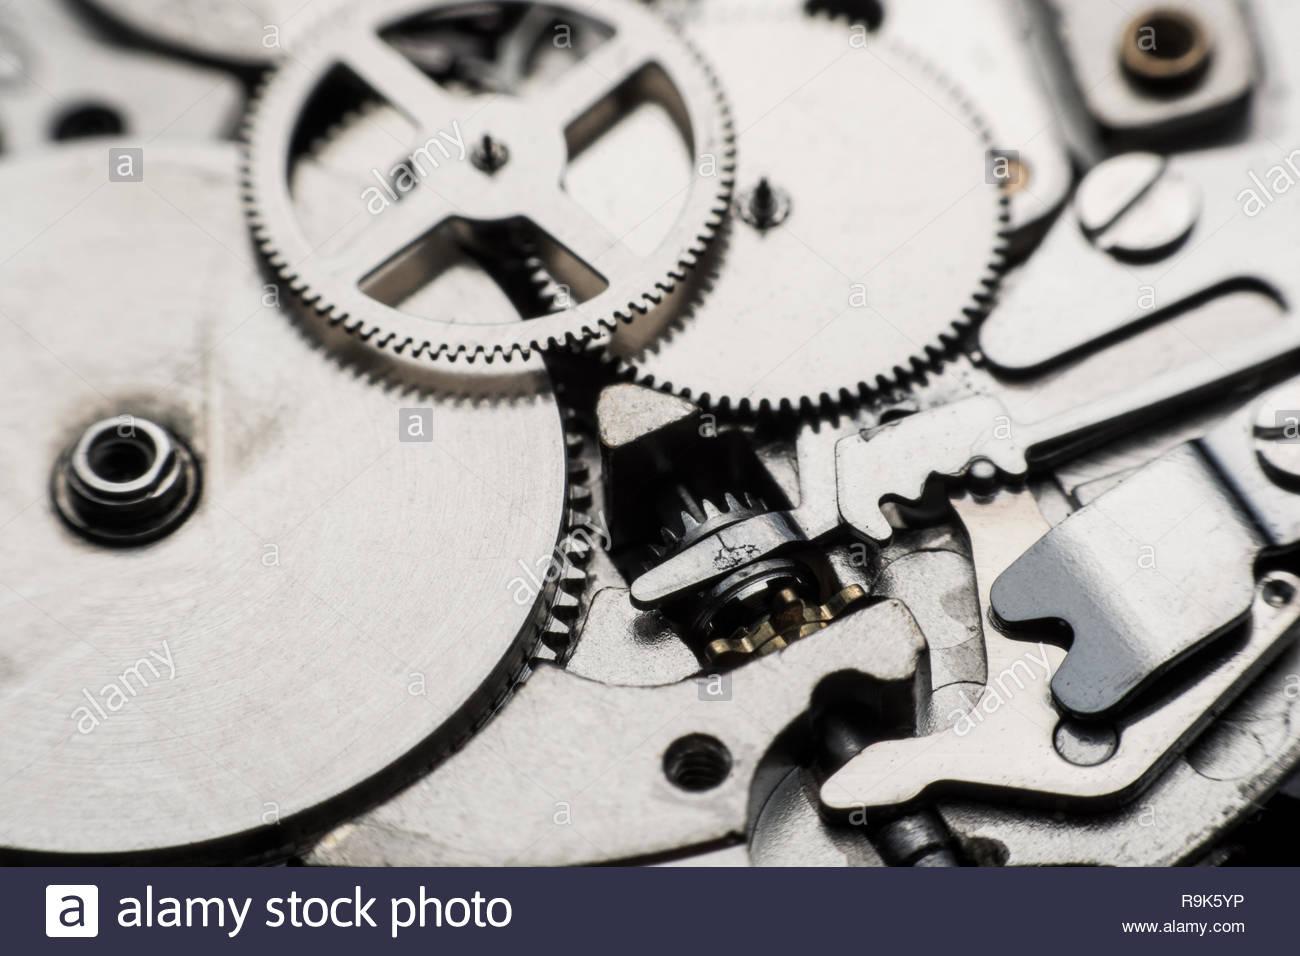 Mechanical watch Gear Clock Close up cogs and gears inside 1300x956